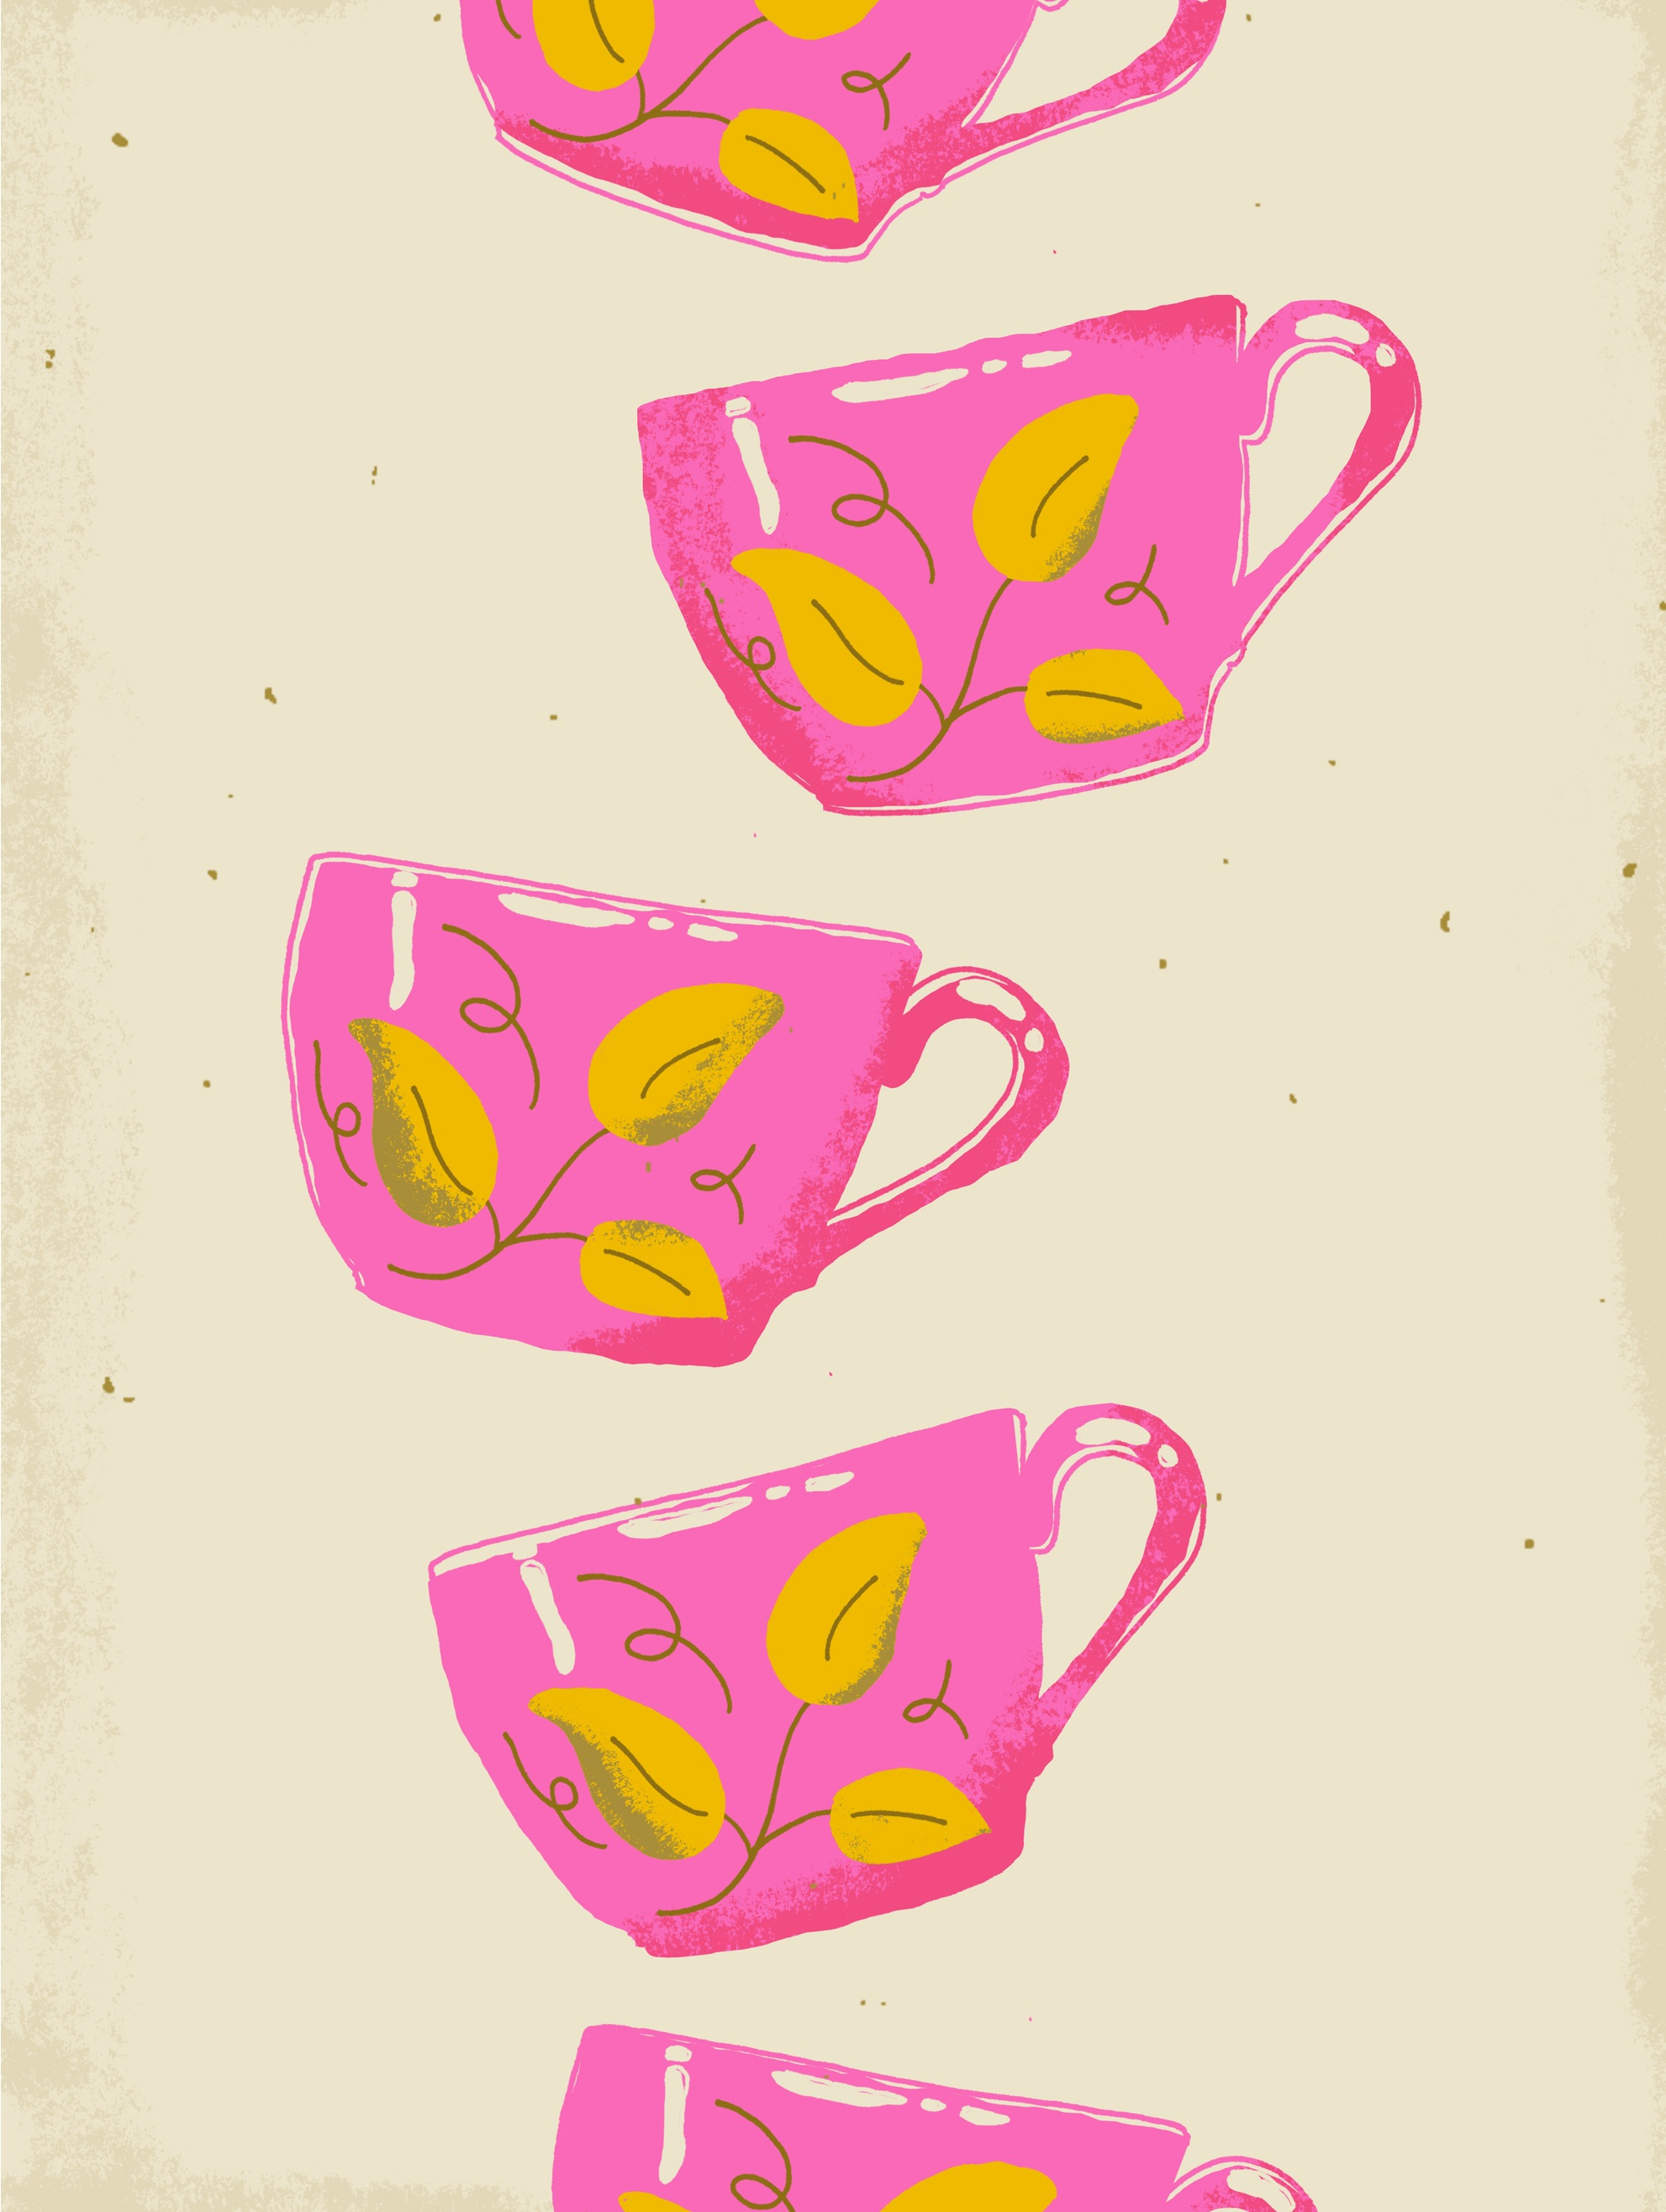 dylan_mierzwinski_PP_teacups.jpg